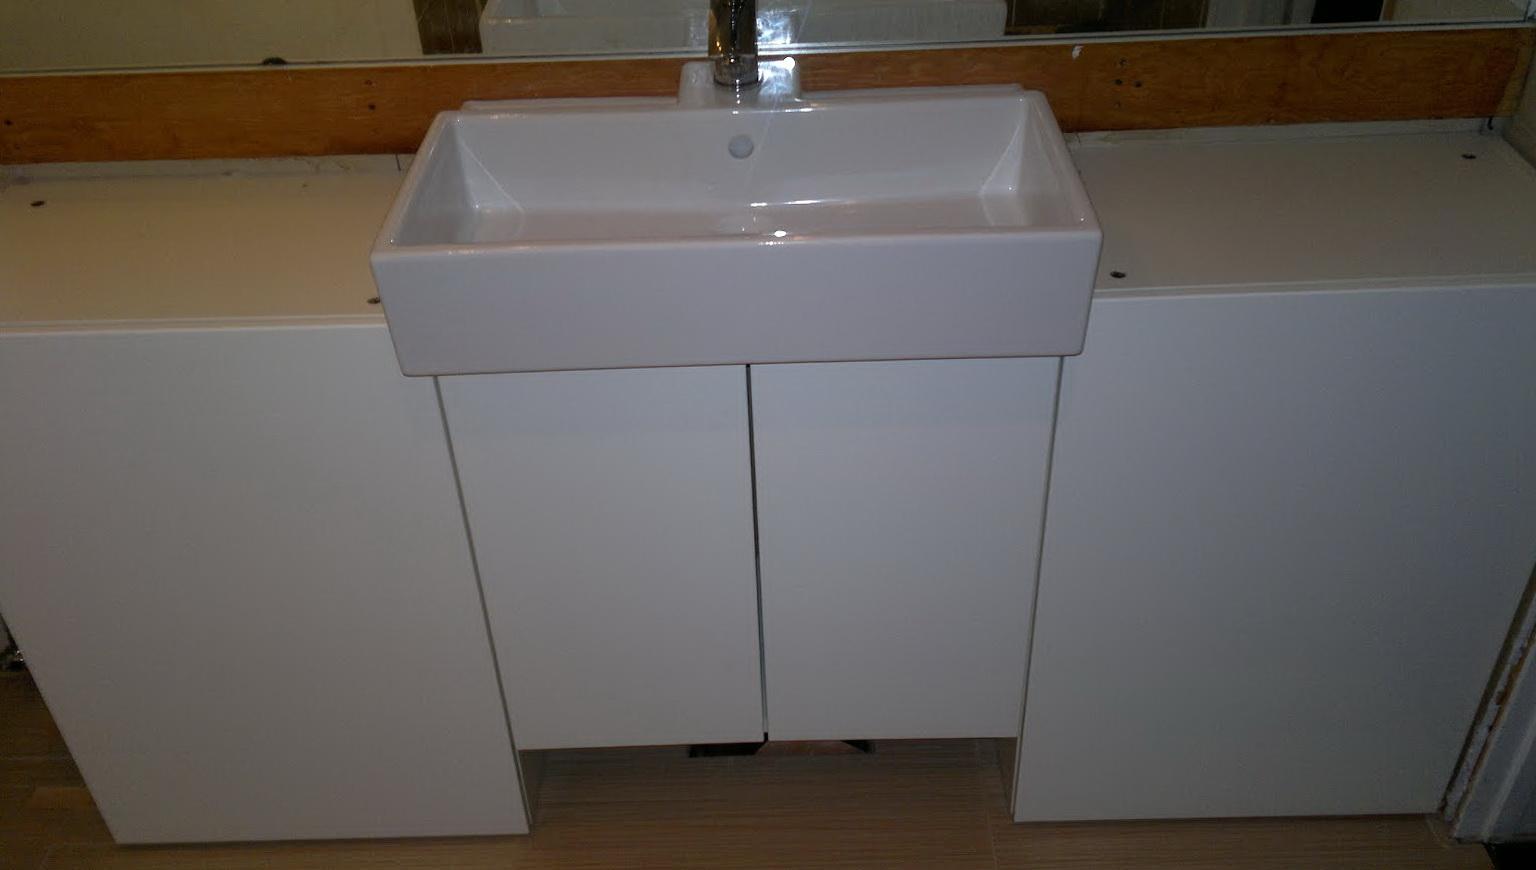 ikea bathroom vanities reviews home design ideas. Black Bedroom Furniture Sets. Home Design Ideas